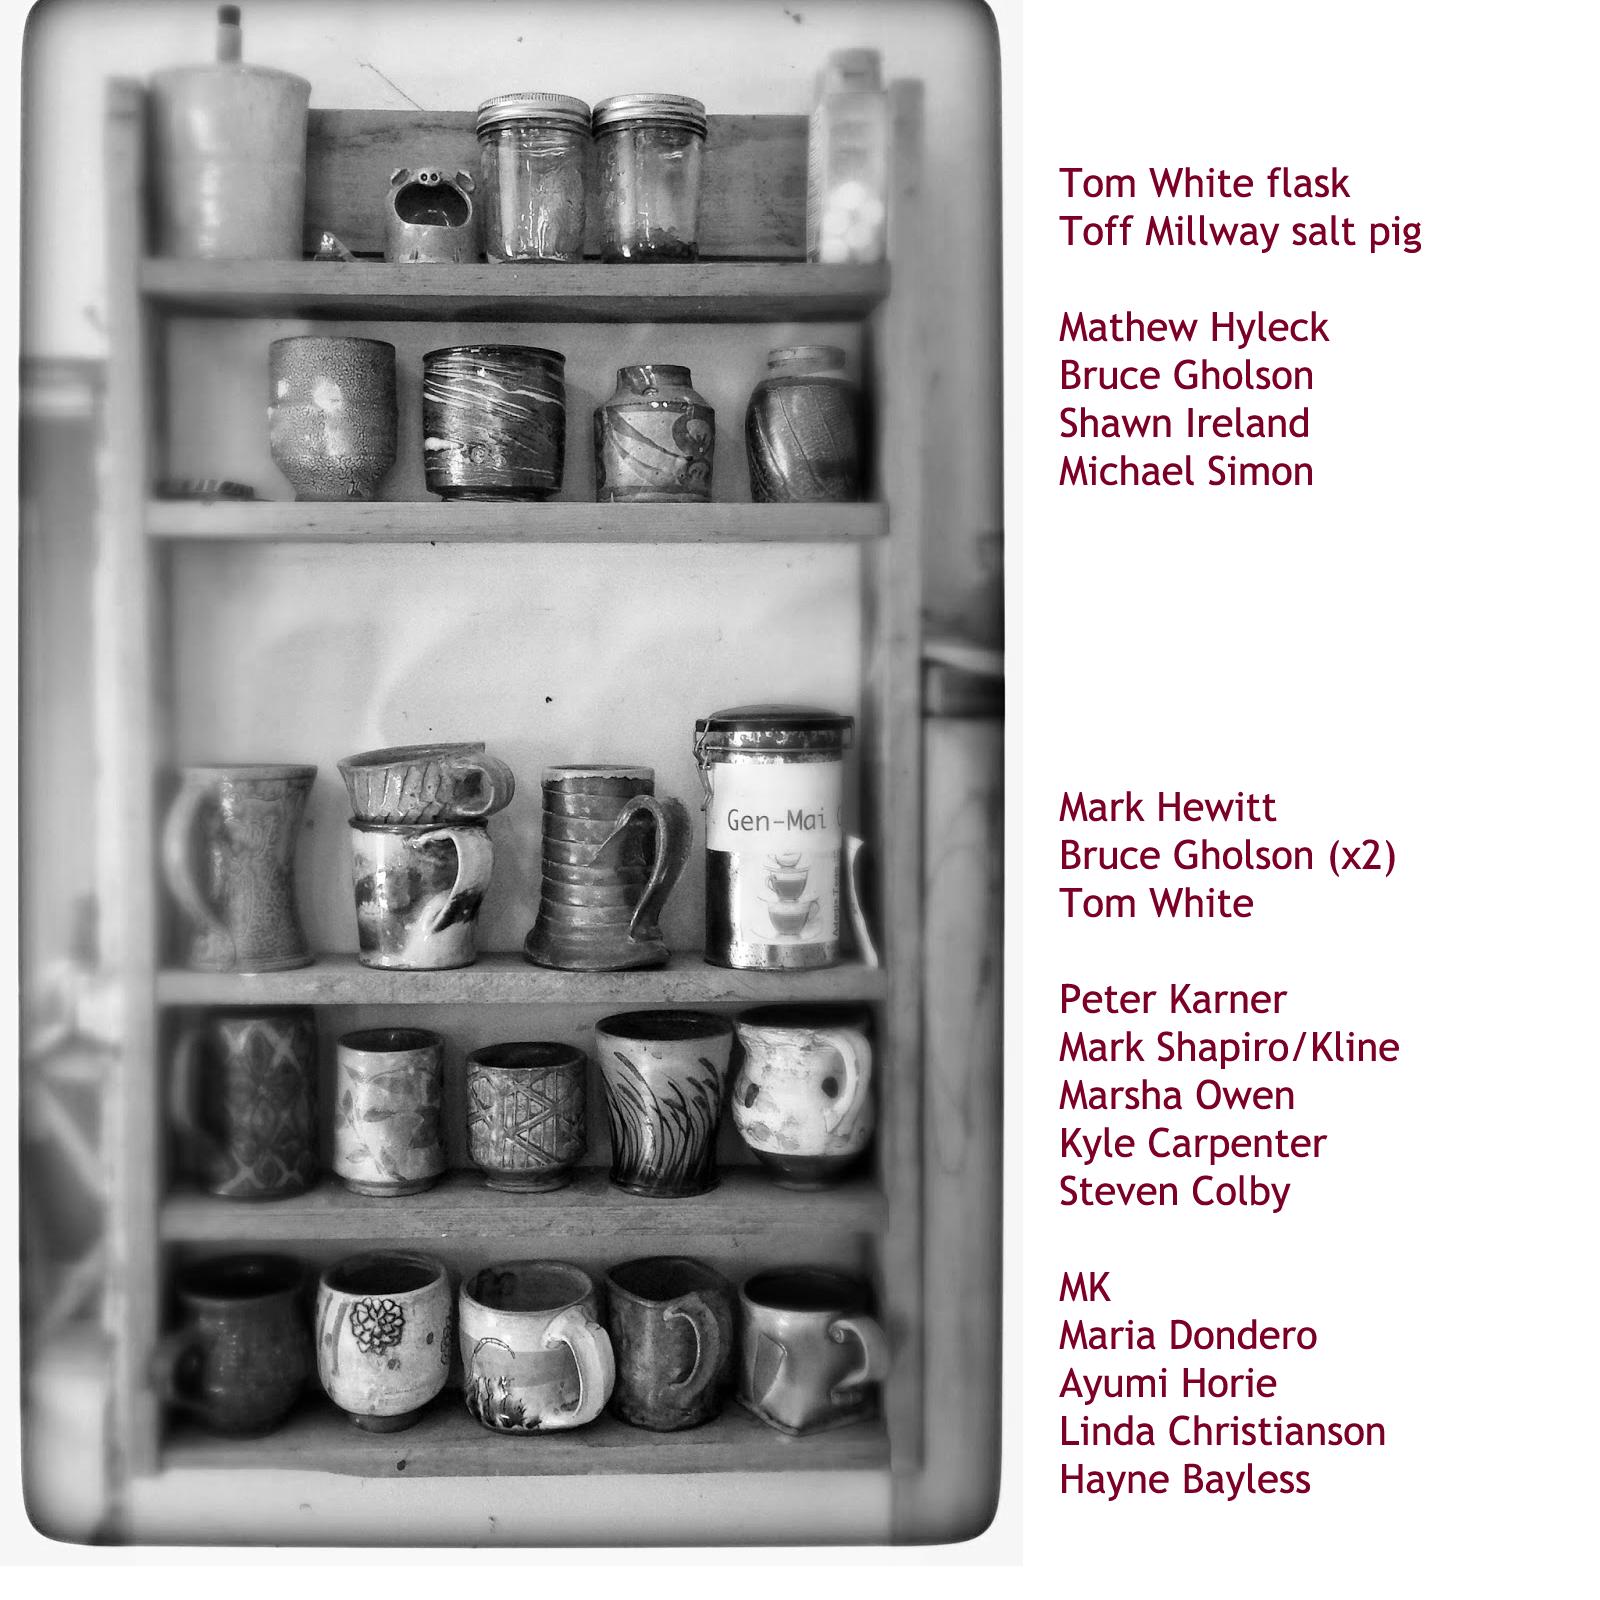 mug rack with pots from Tom White, Michael Simon, Kyle Carpenter, Shawn Ireland, Mark Hewitt, Bruce Gholson, Matt Hyleck, Maria Dondero, Ayumi Horie, Hayne Bayless